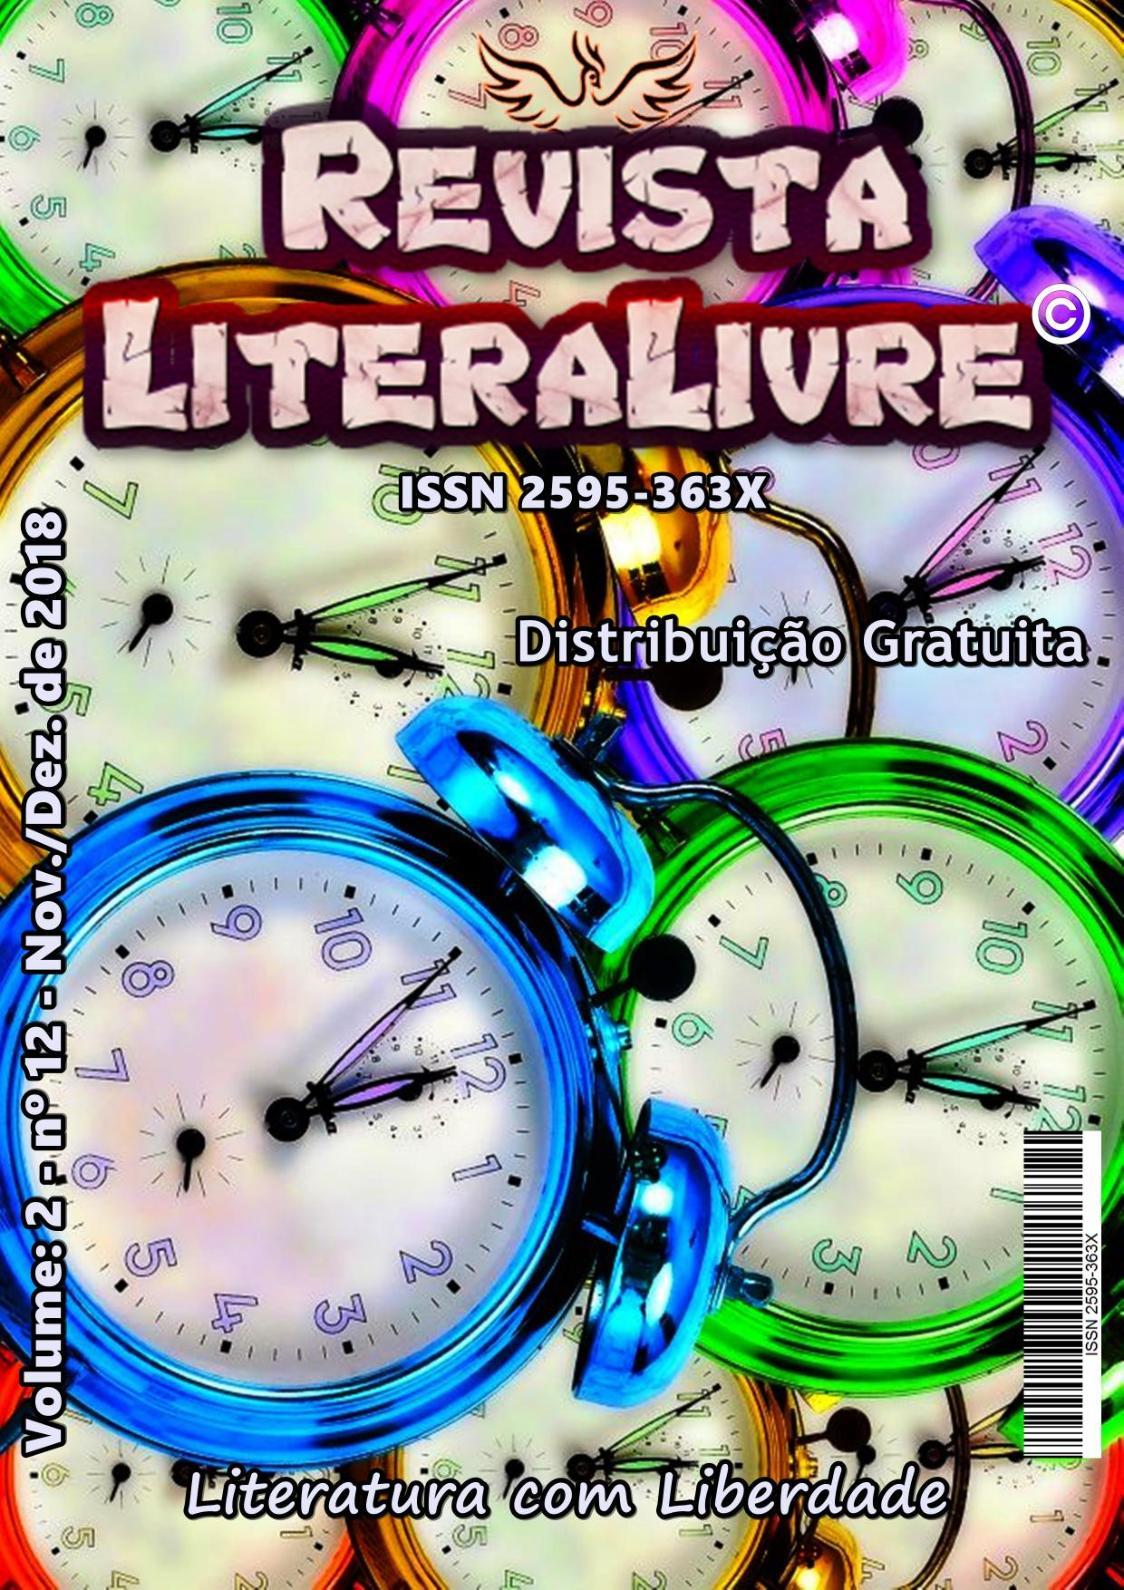 2f589c68b5 Calaméo - Revista Litera Livre 12ª Edição